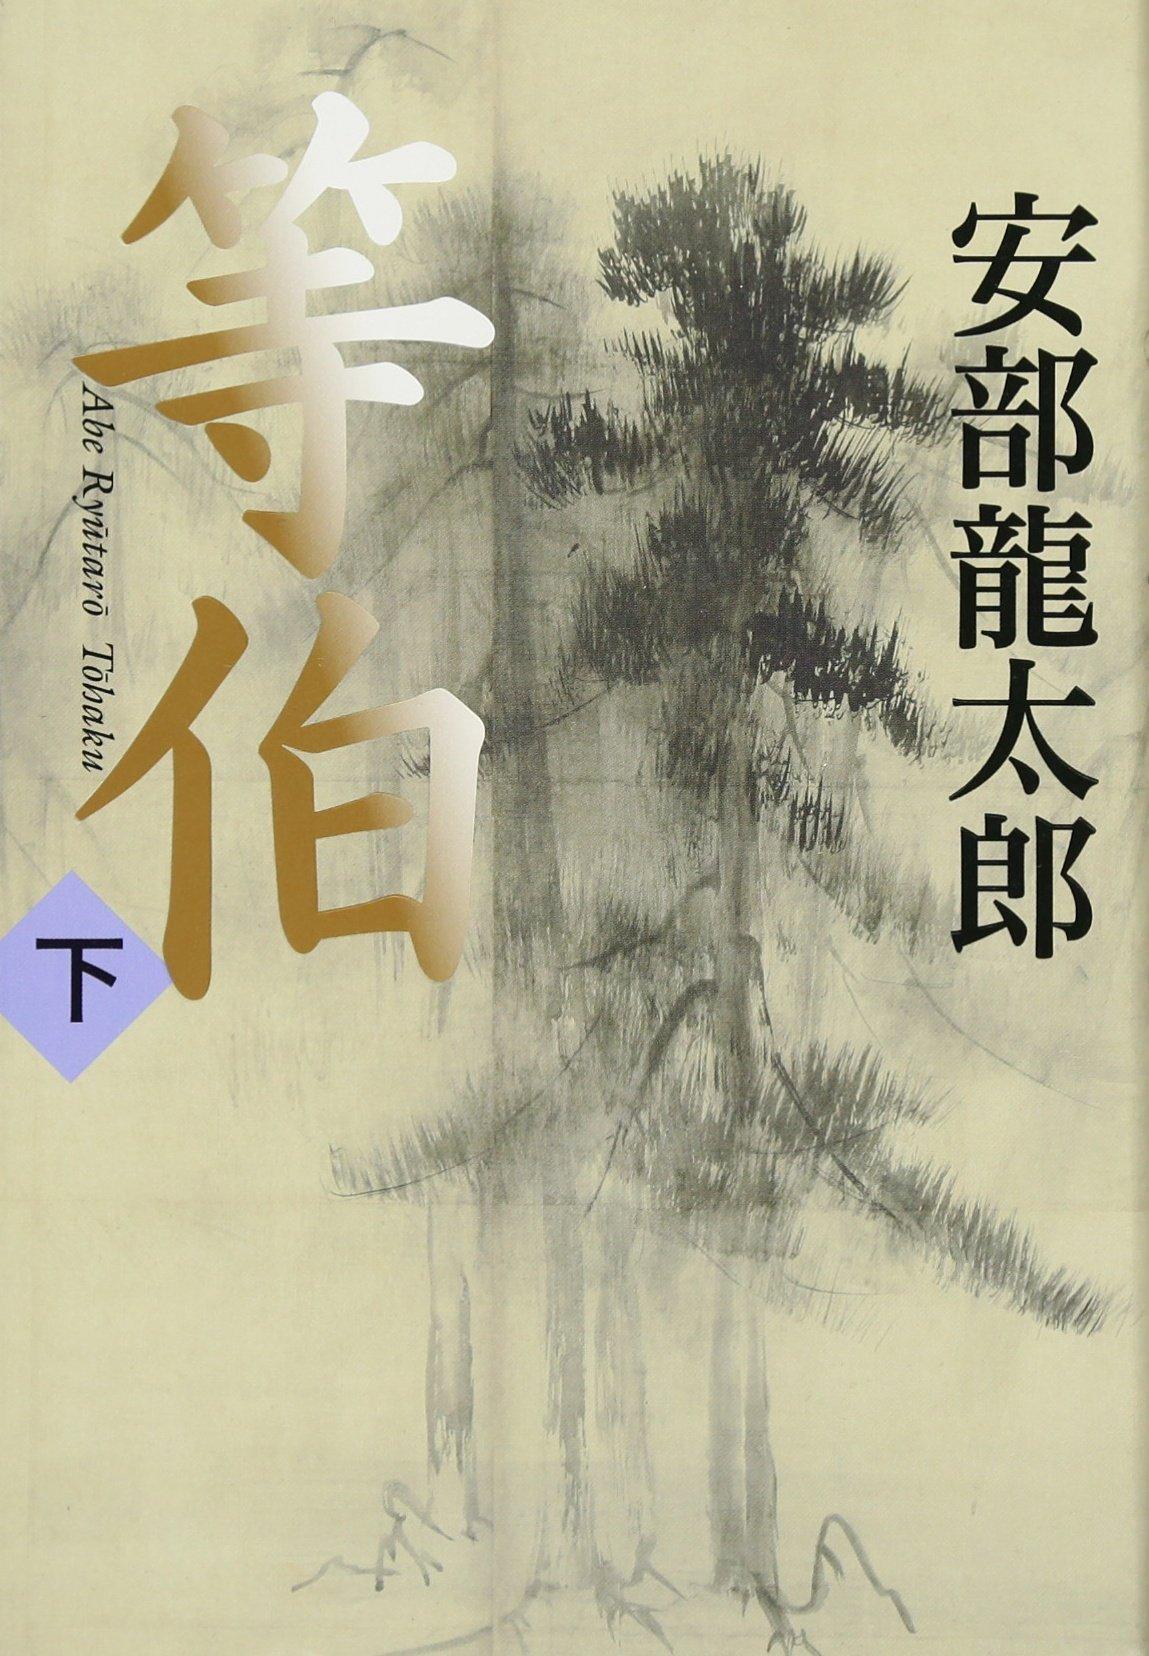 Download Tohaku Vol. 2 of 2 (Japanese Edition) PDF